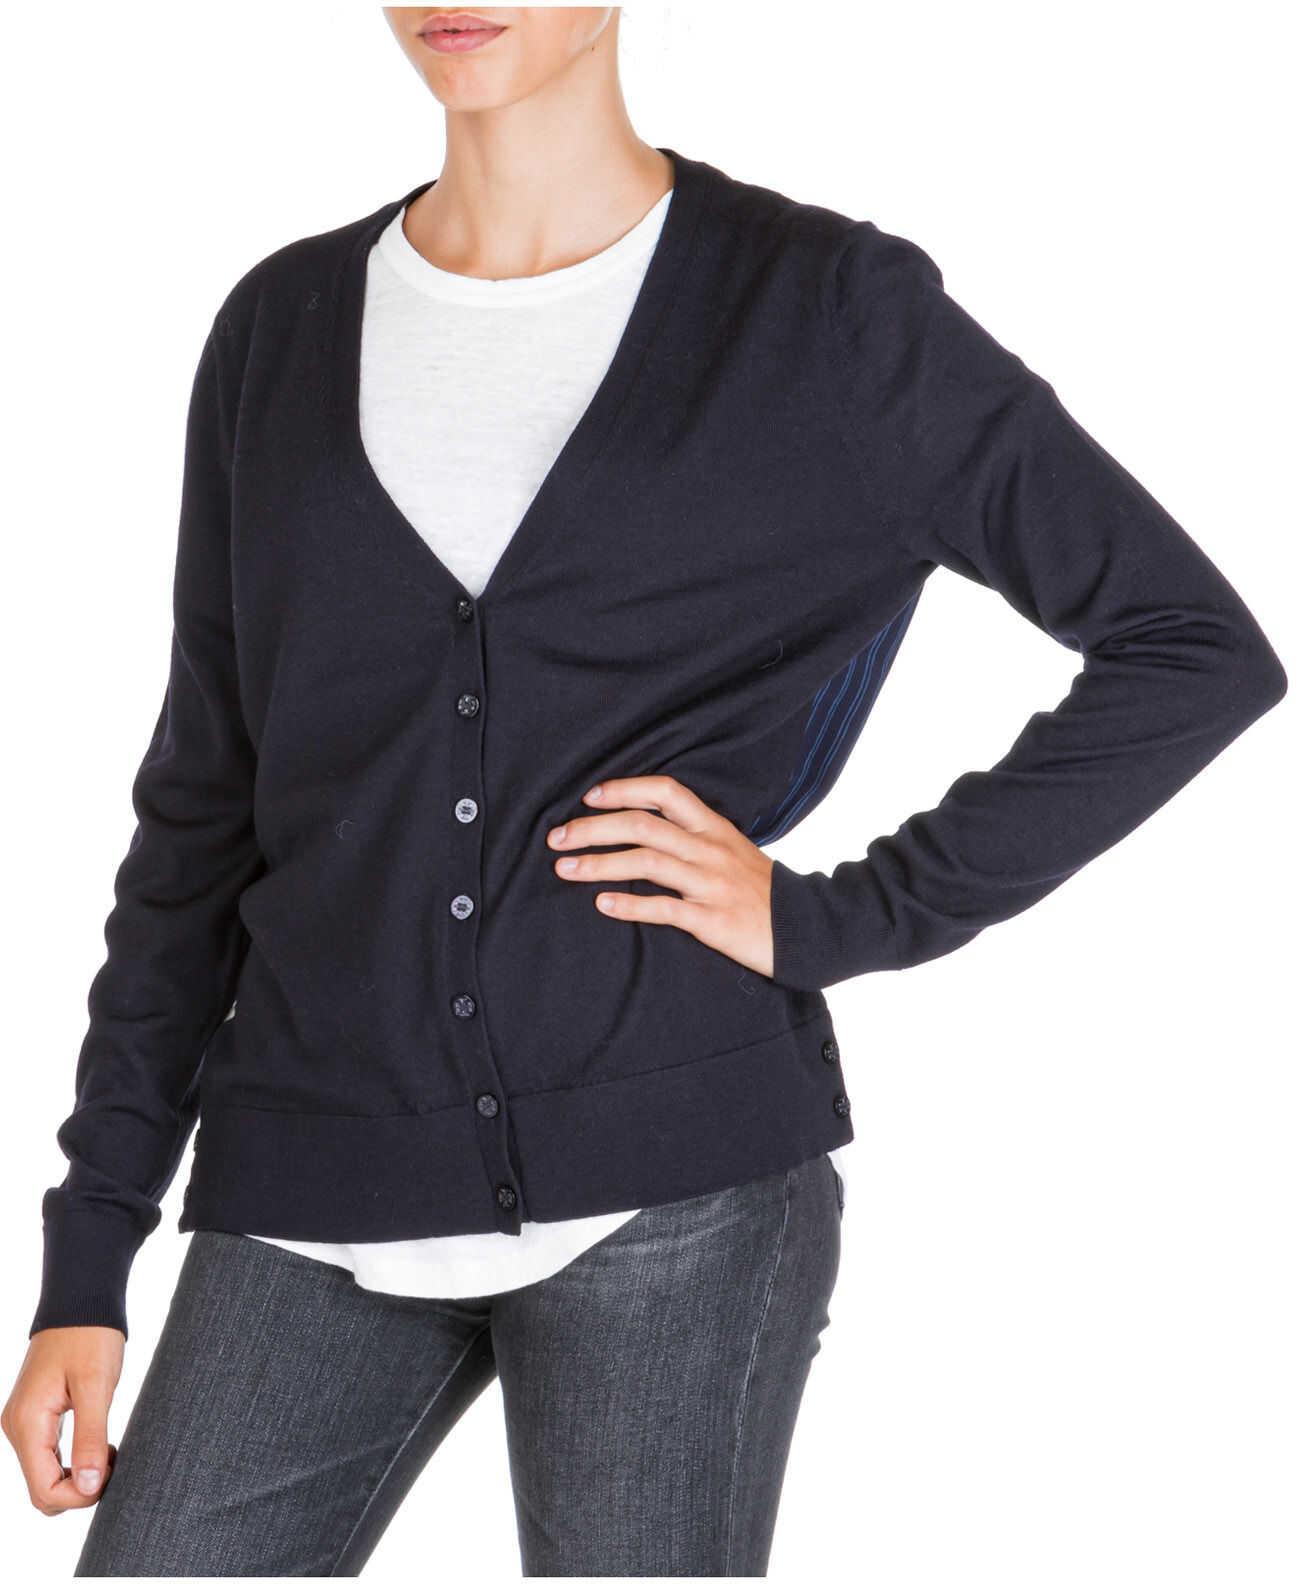 Tory Burch Cardigan Sweater Blue